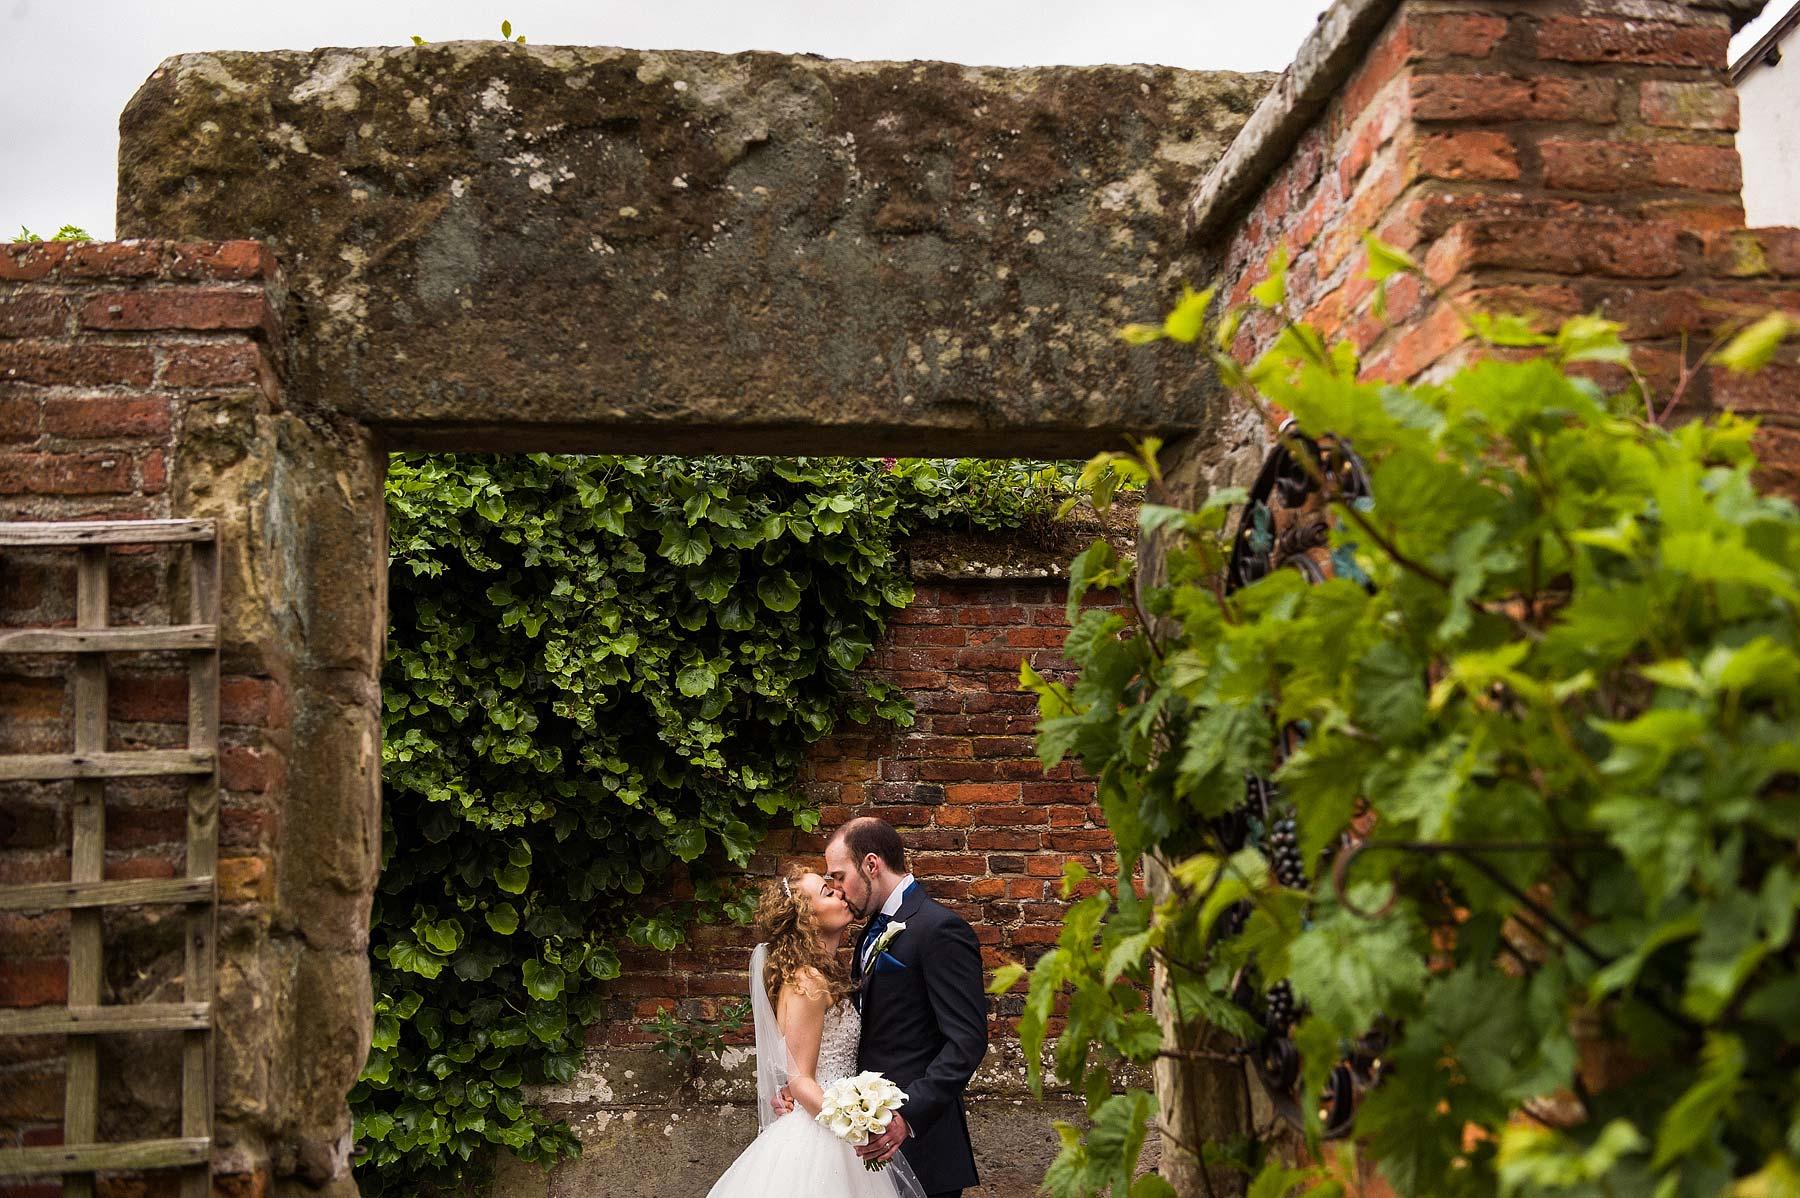 albright-hussey-manor-wedding-photographers-053